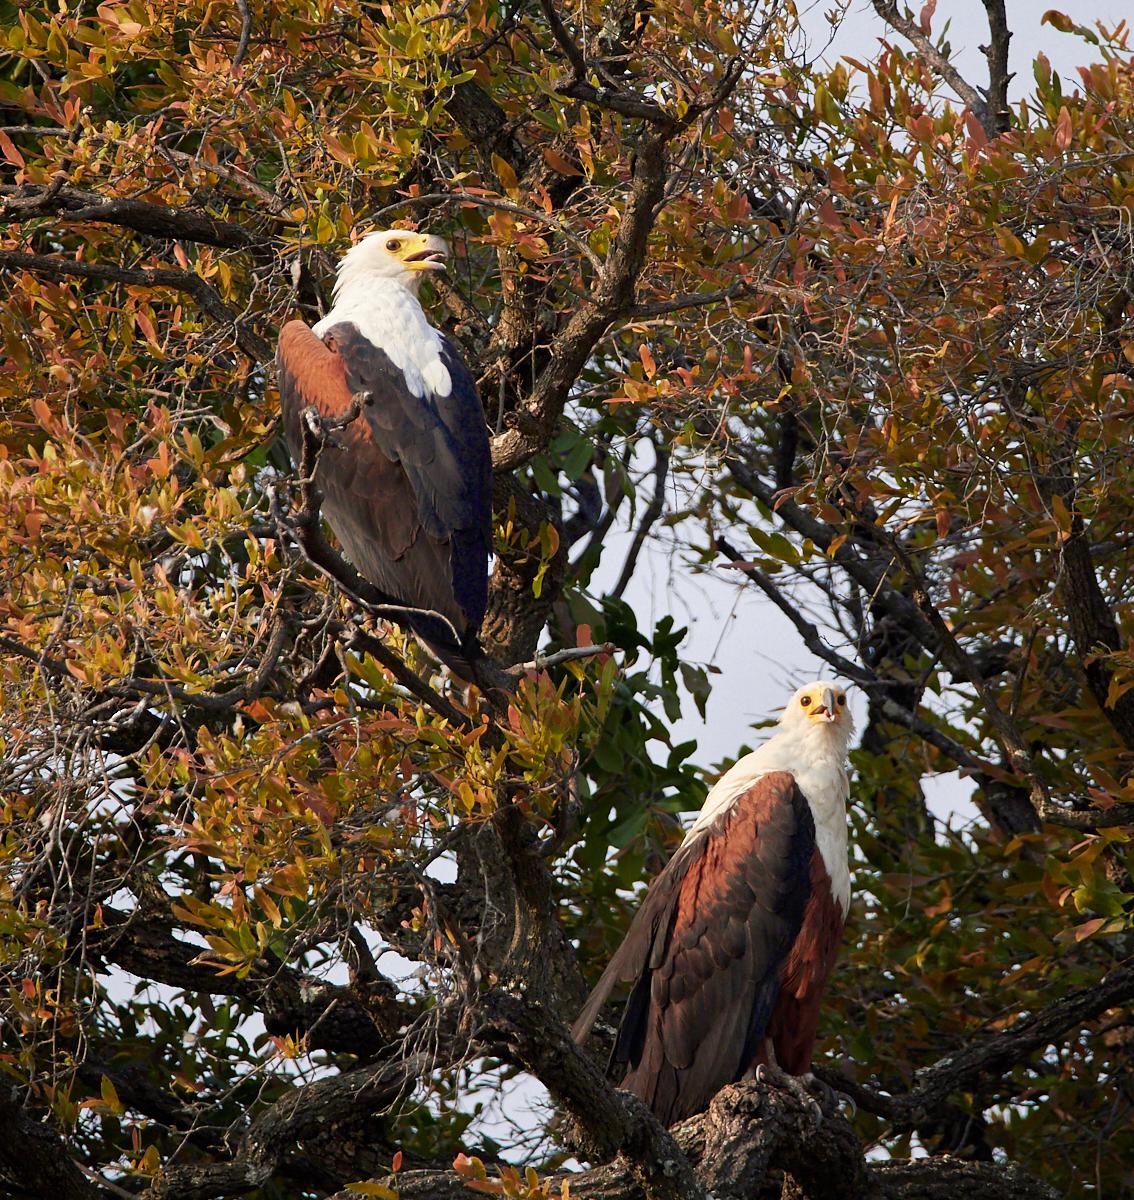 Fish Eagles 1600x1200 sRGB.jpg